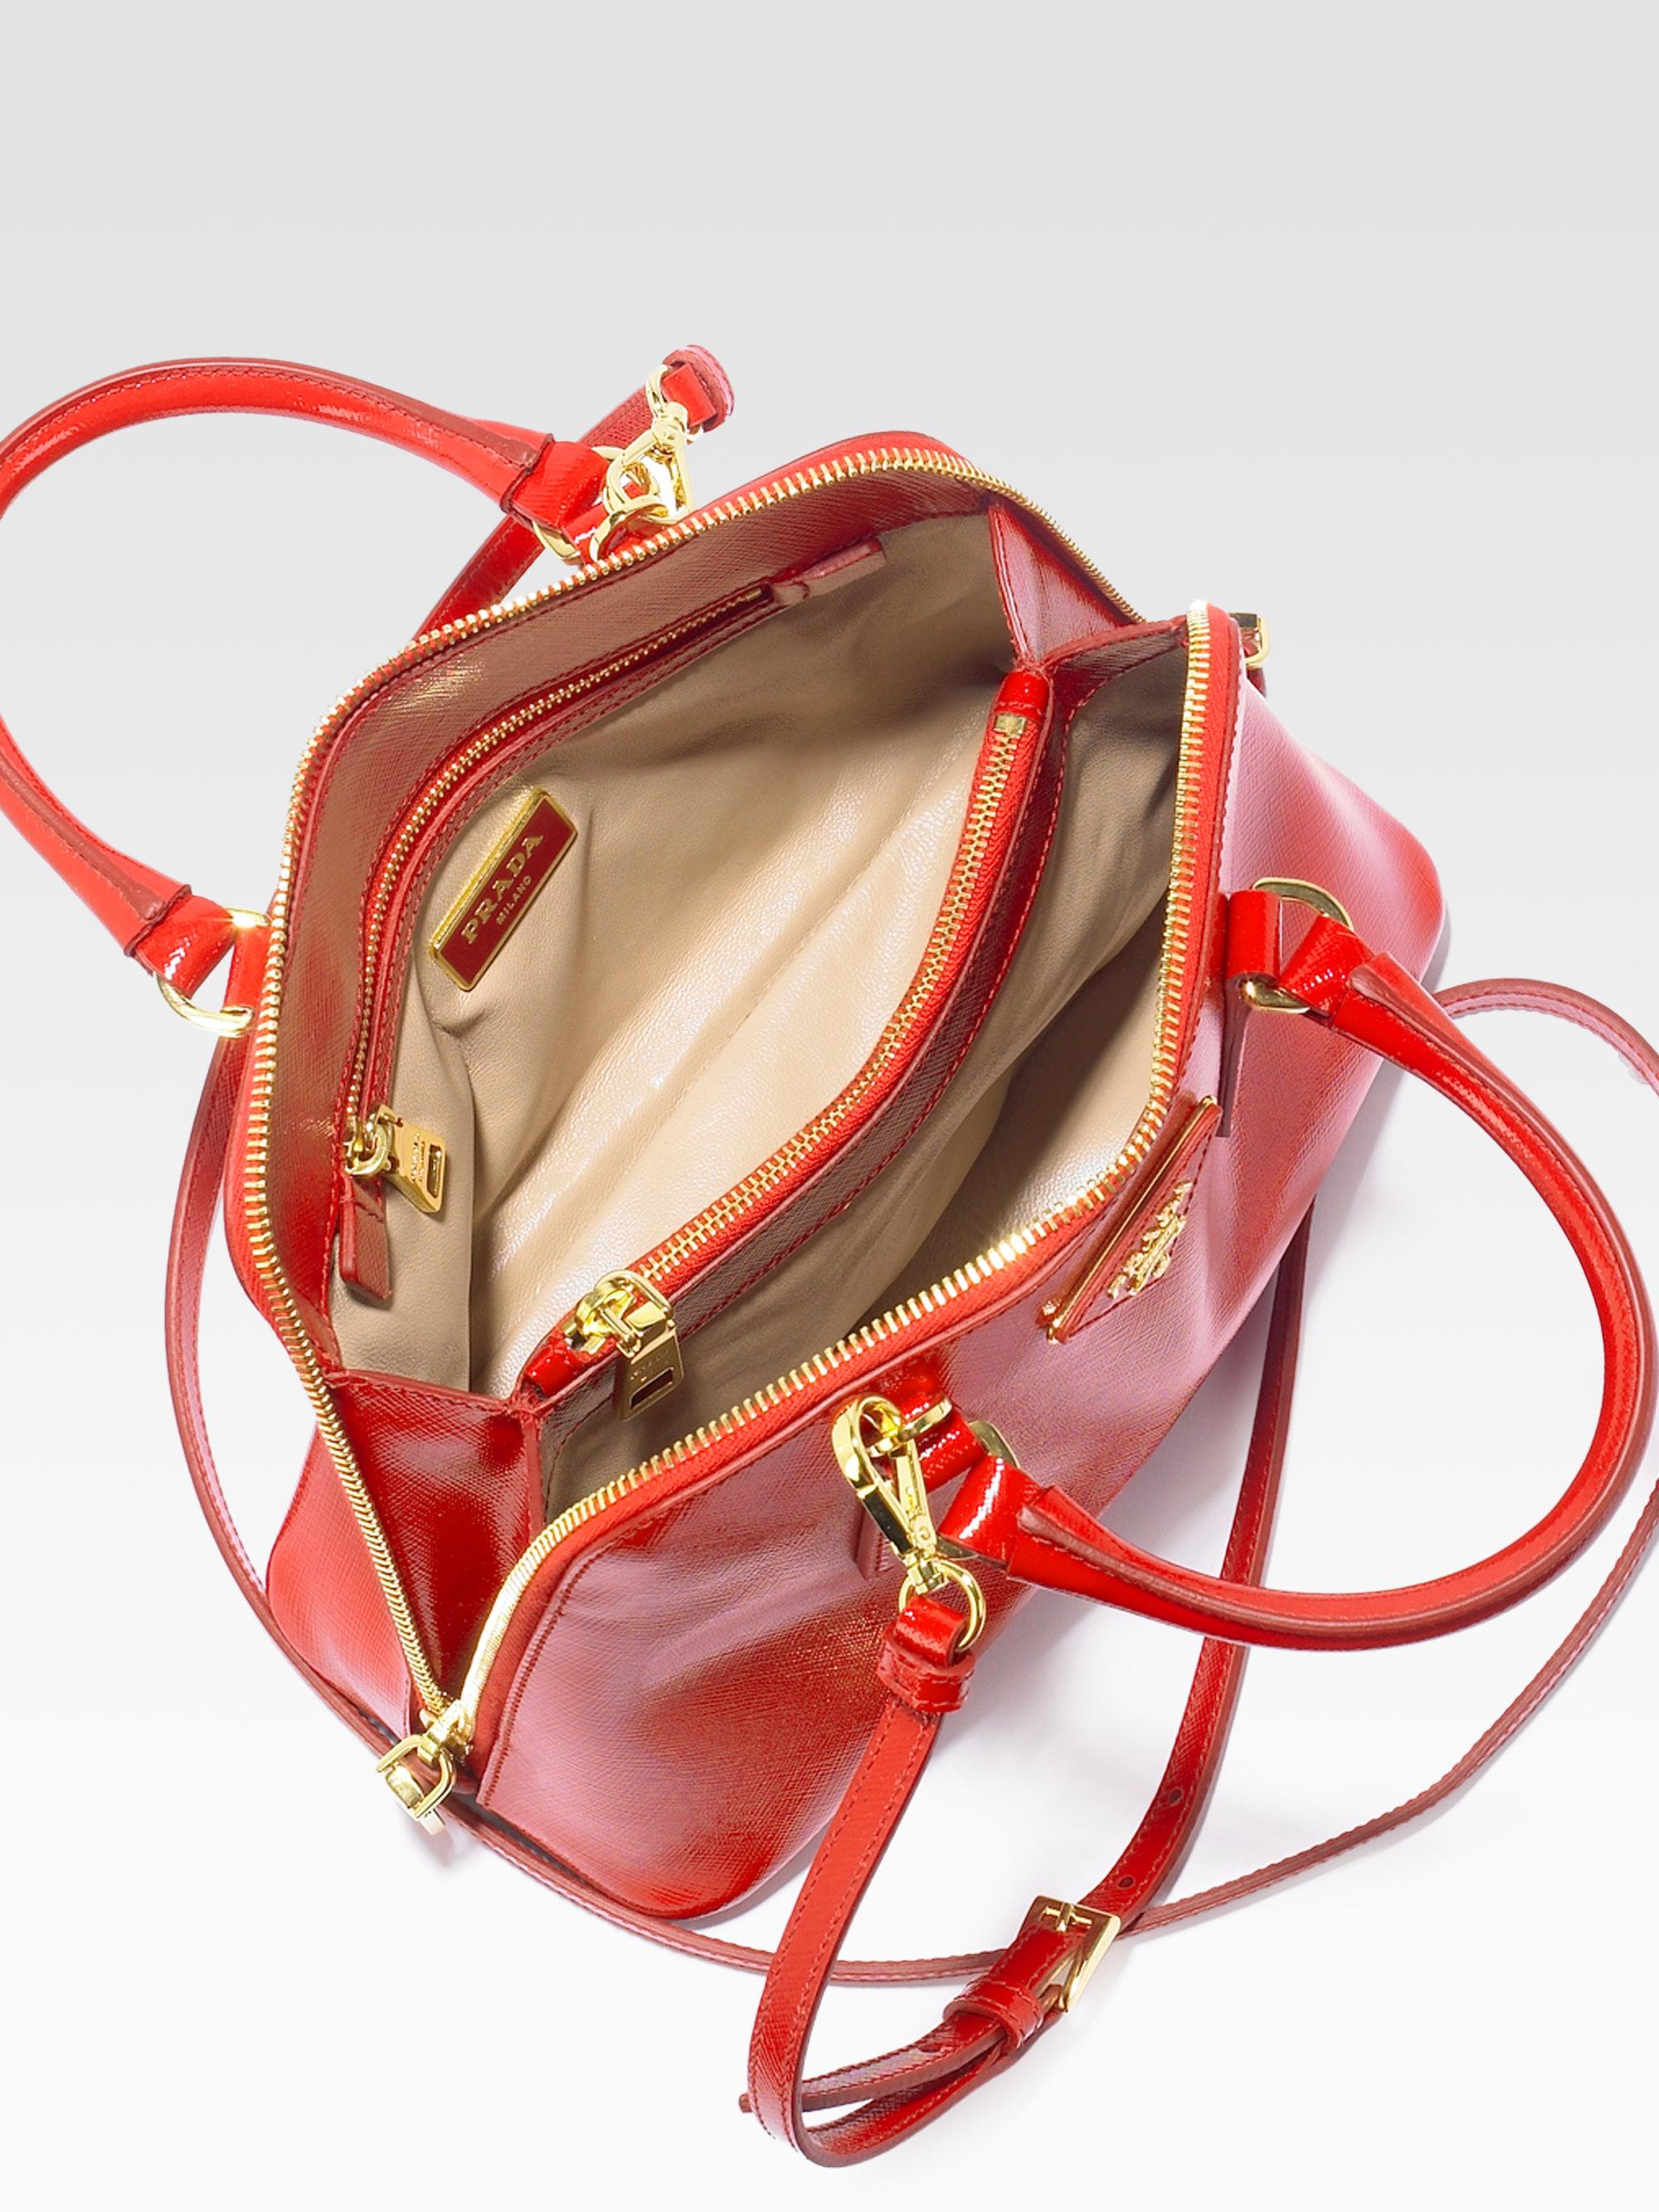 Prada Saffiano Vernice Small Round Top Handle Bag In Black